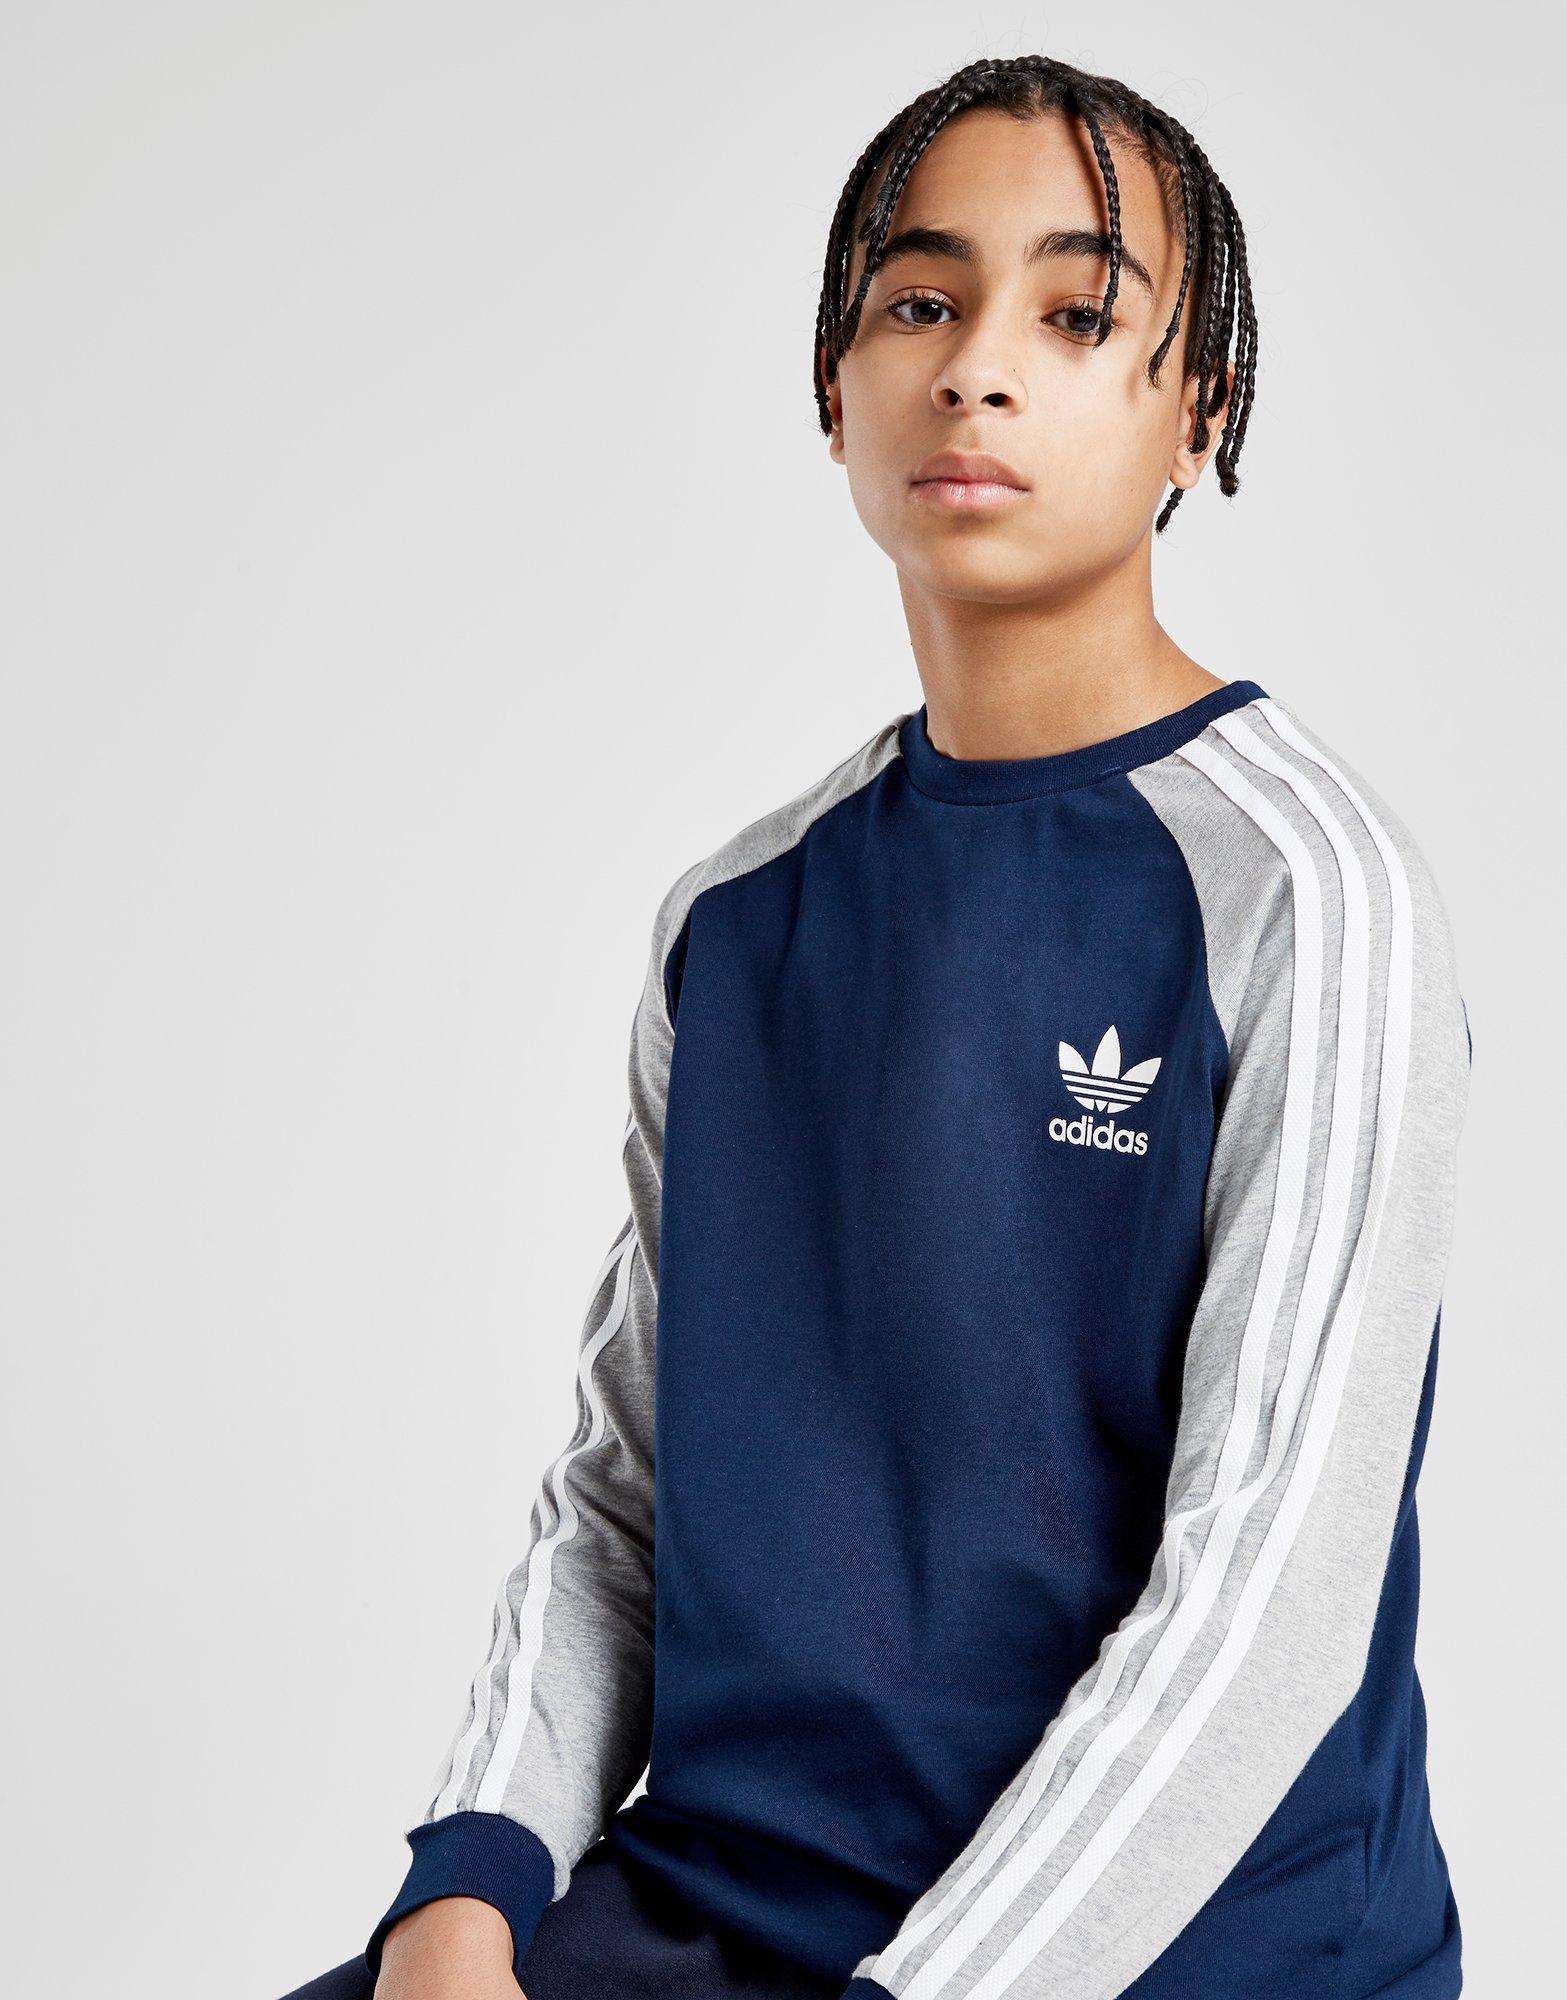 T Originals Sleeve California Shirt JuniorJd Sports Adidas Long oCxedBrW